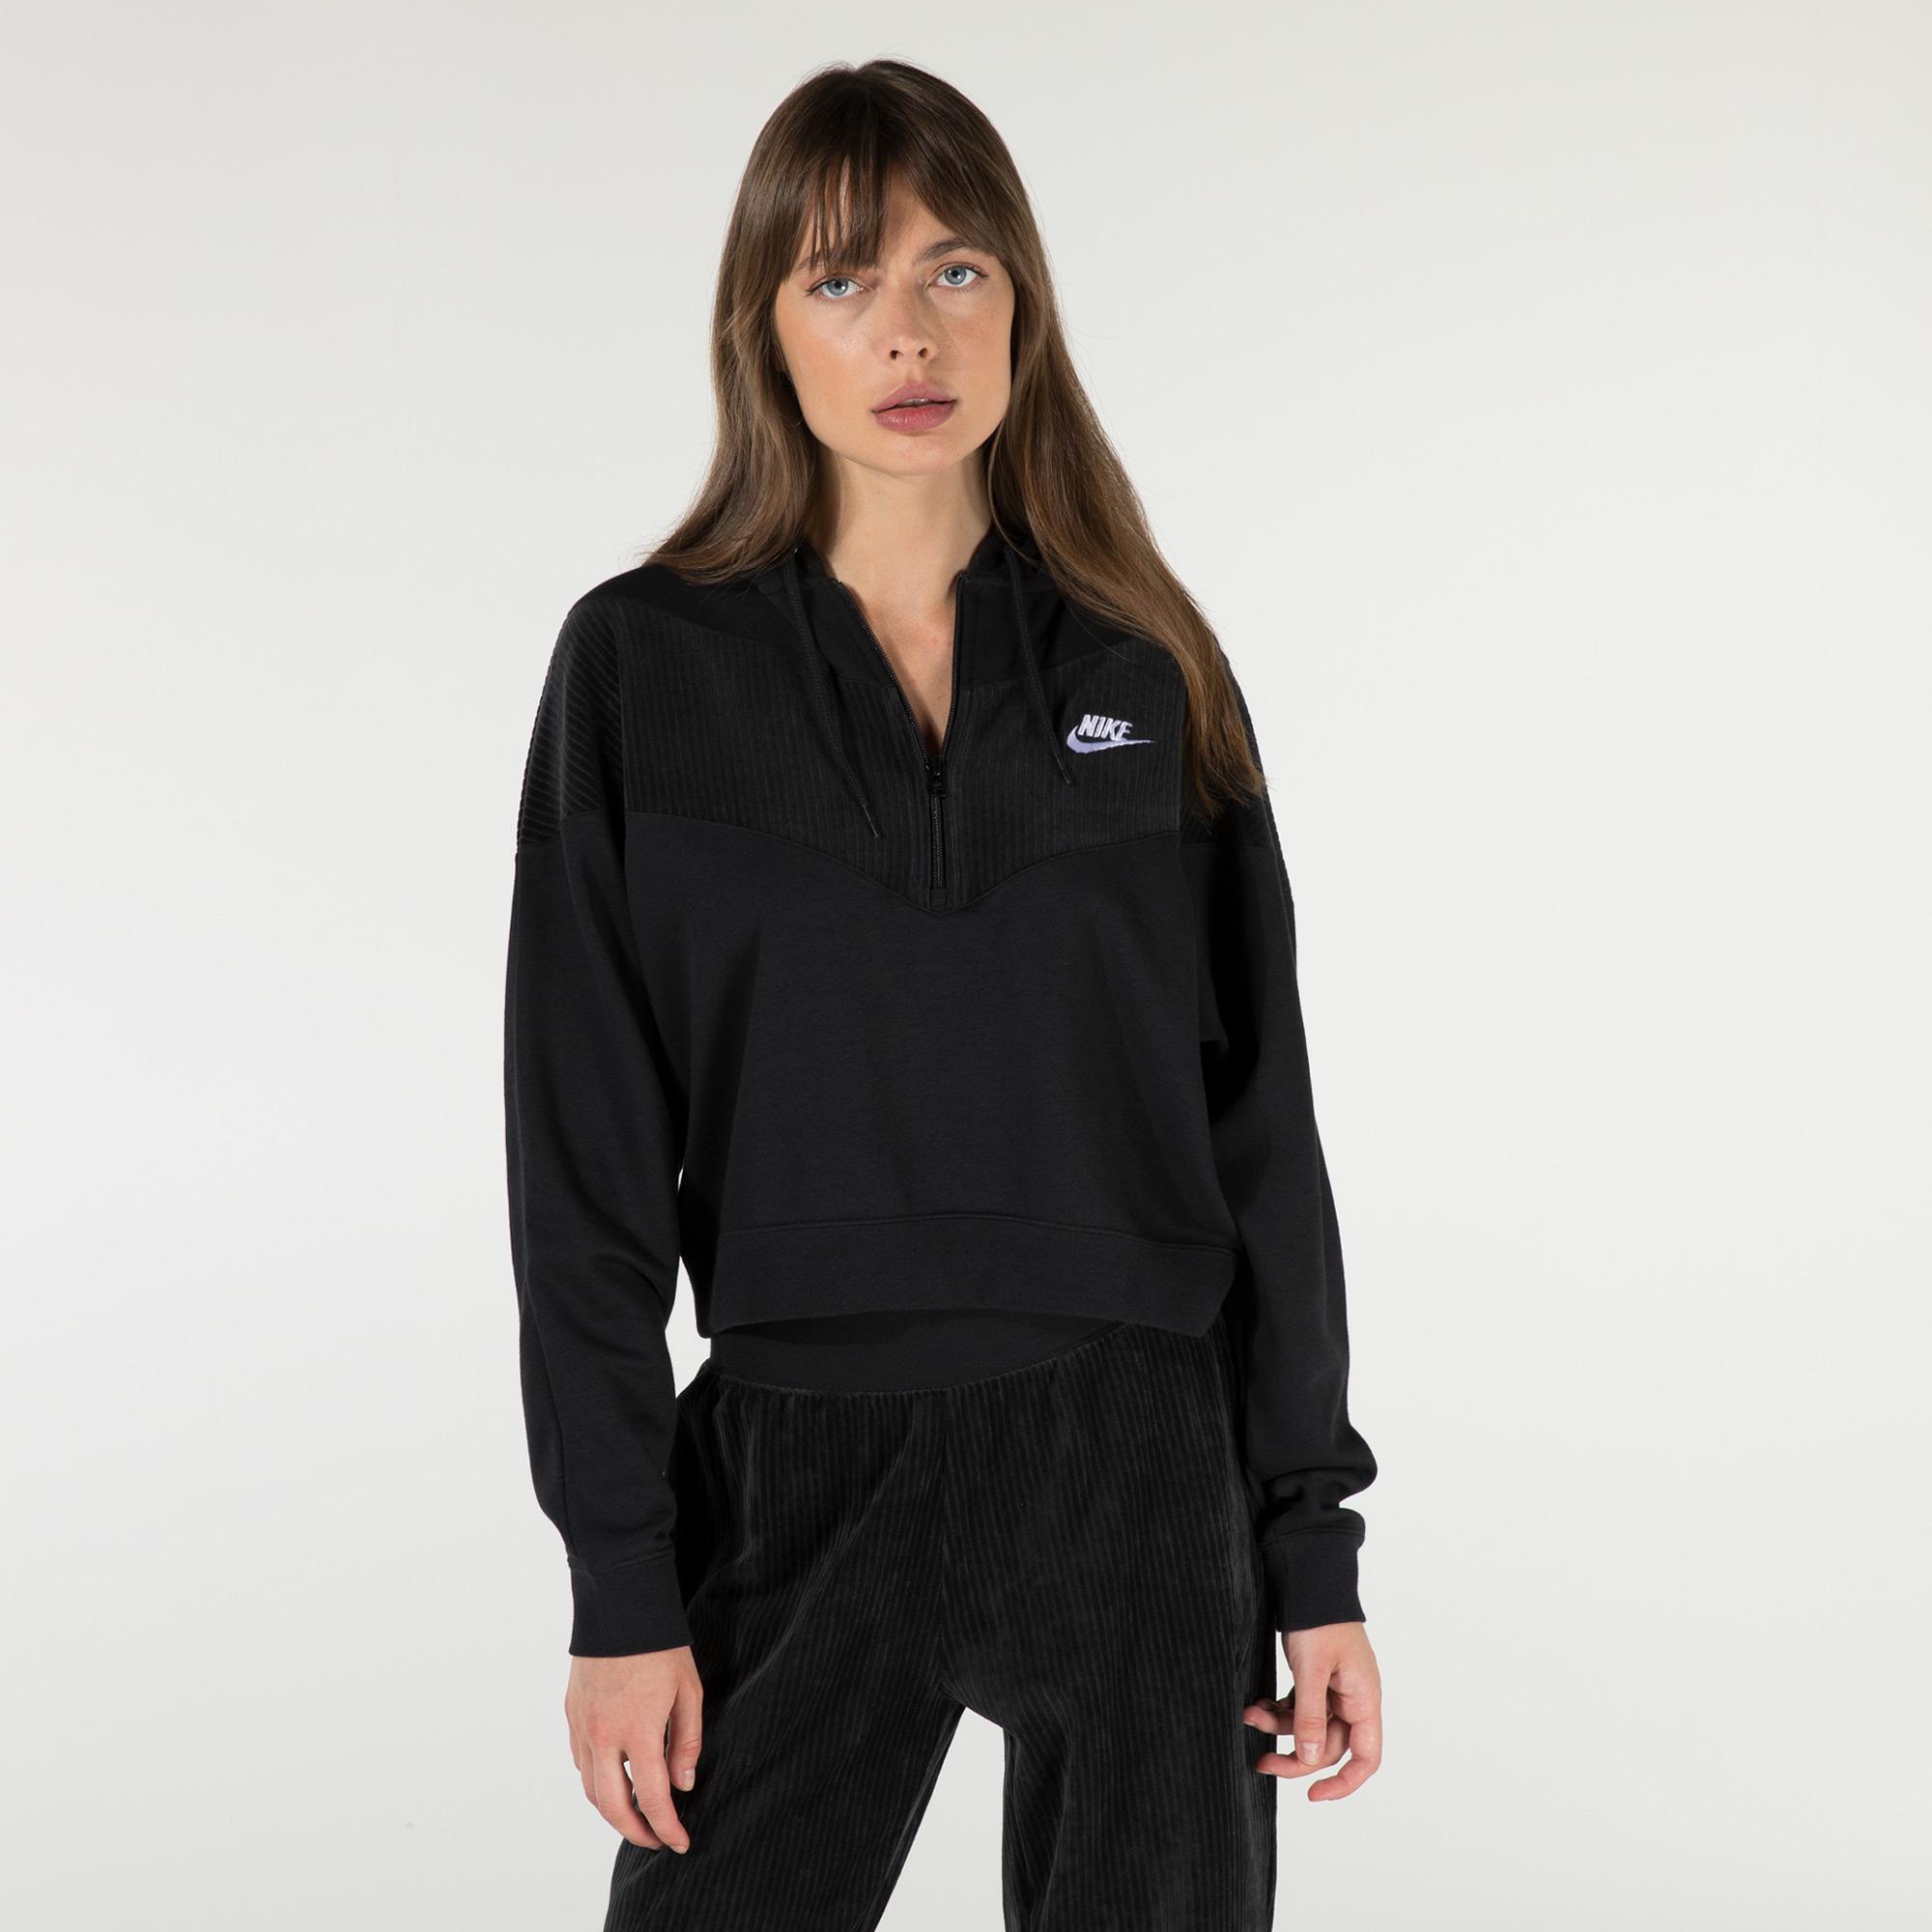 Nike Kadın Siyah Sweatshirt